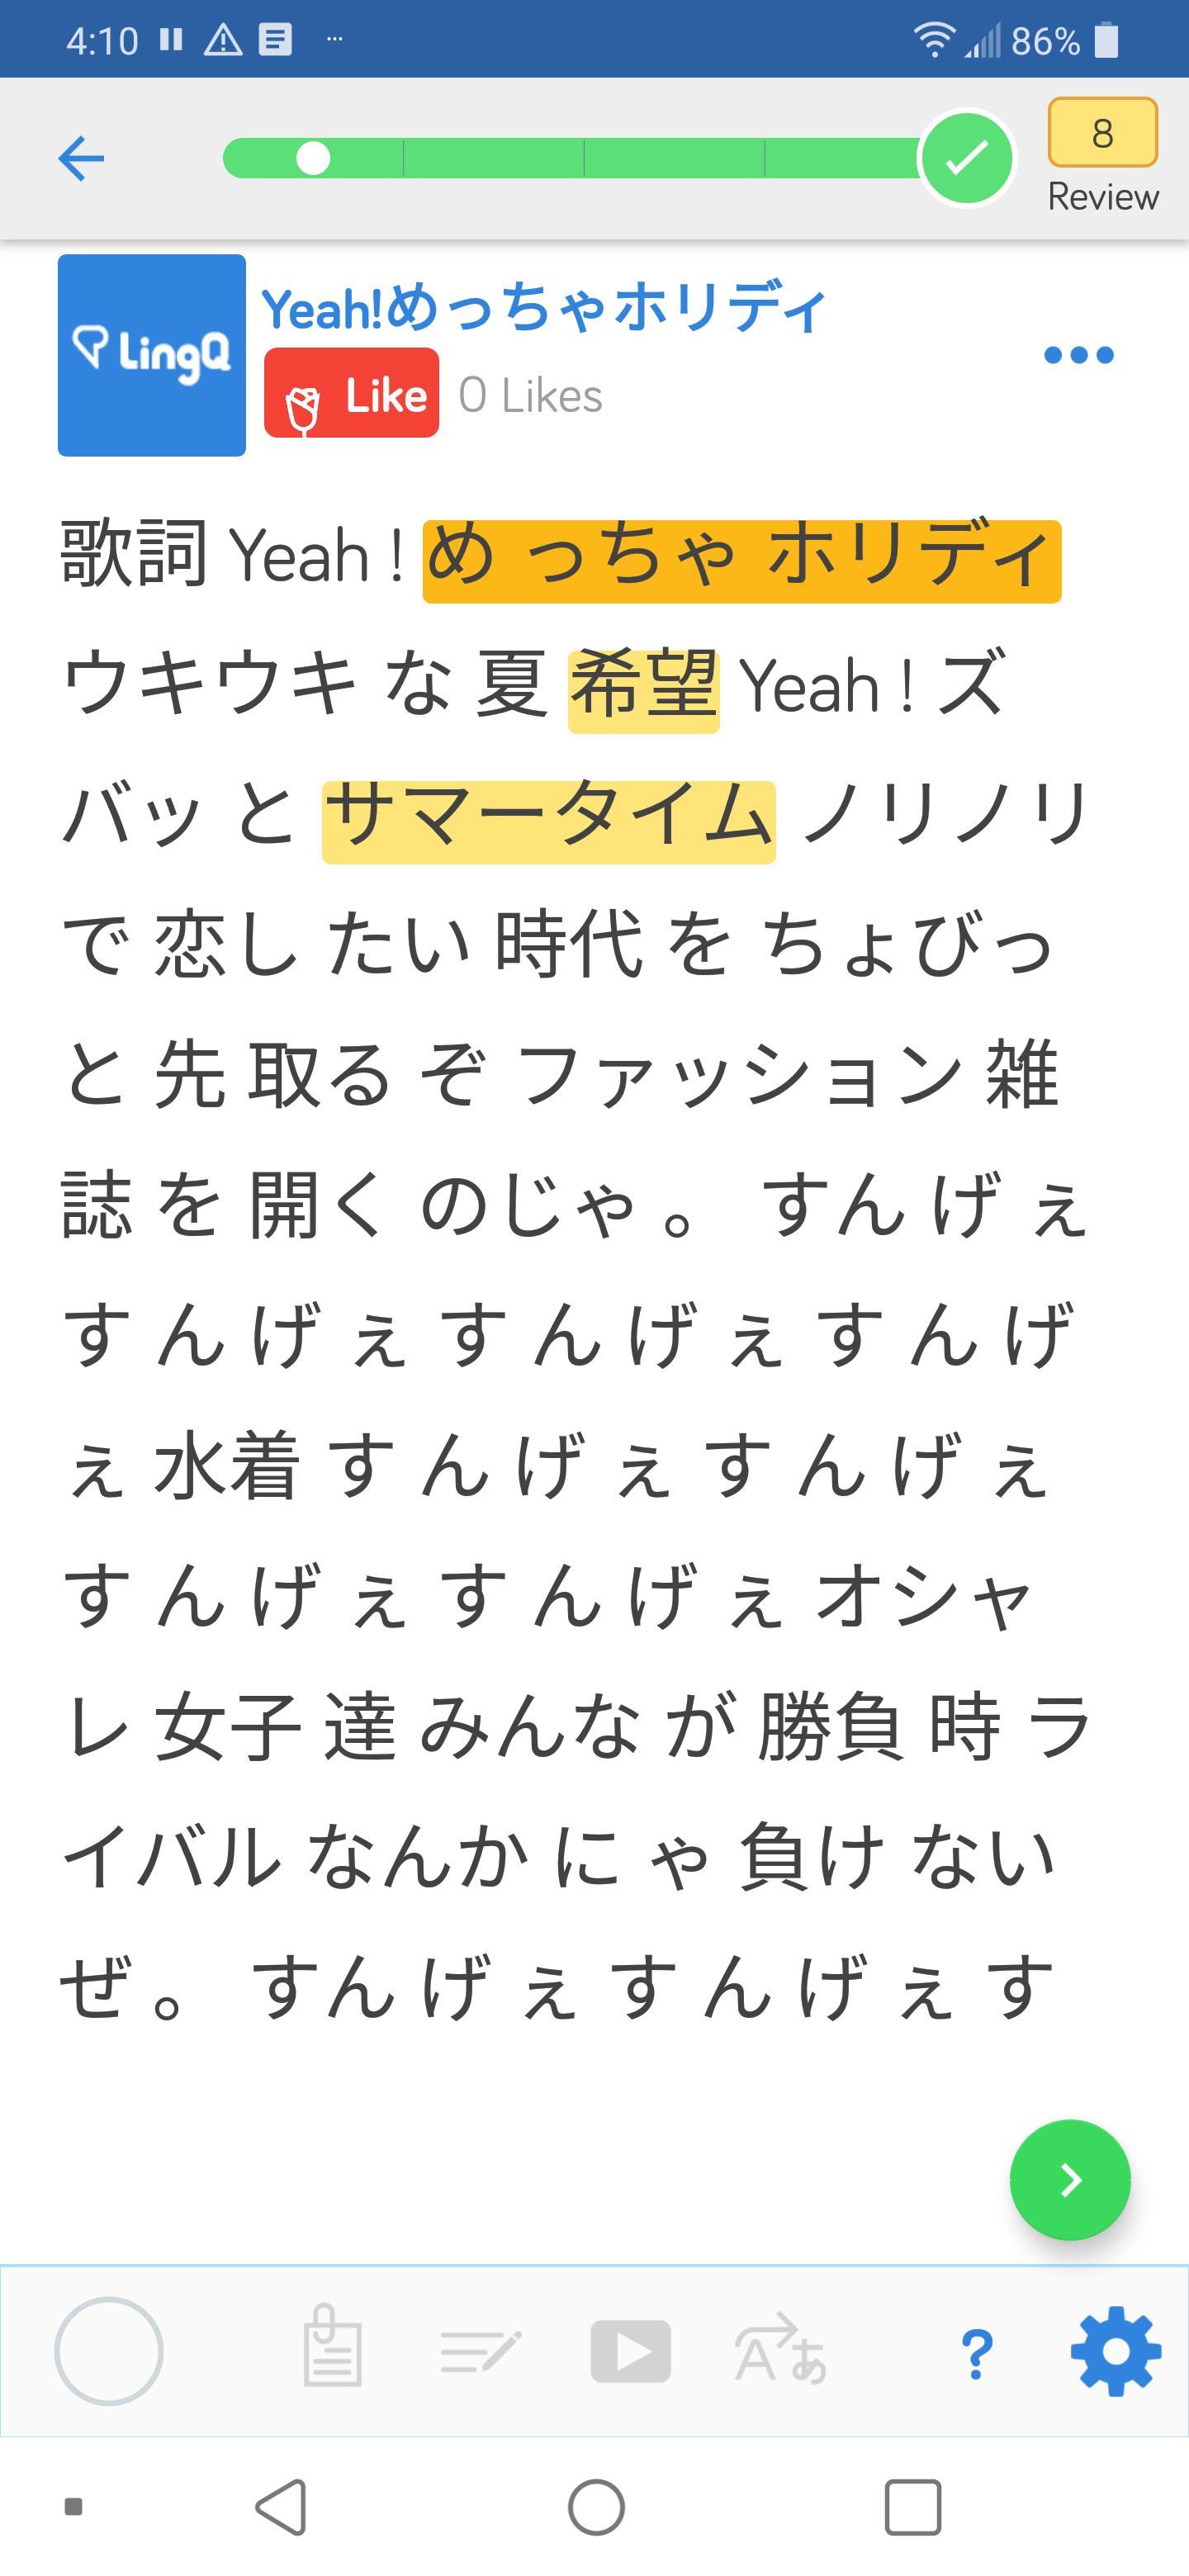 Learn Japanese on LingQ